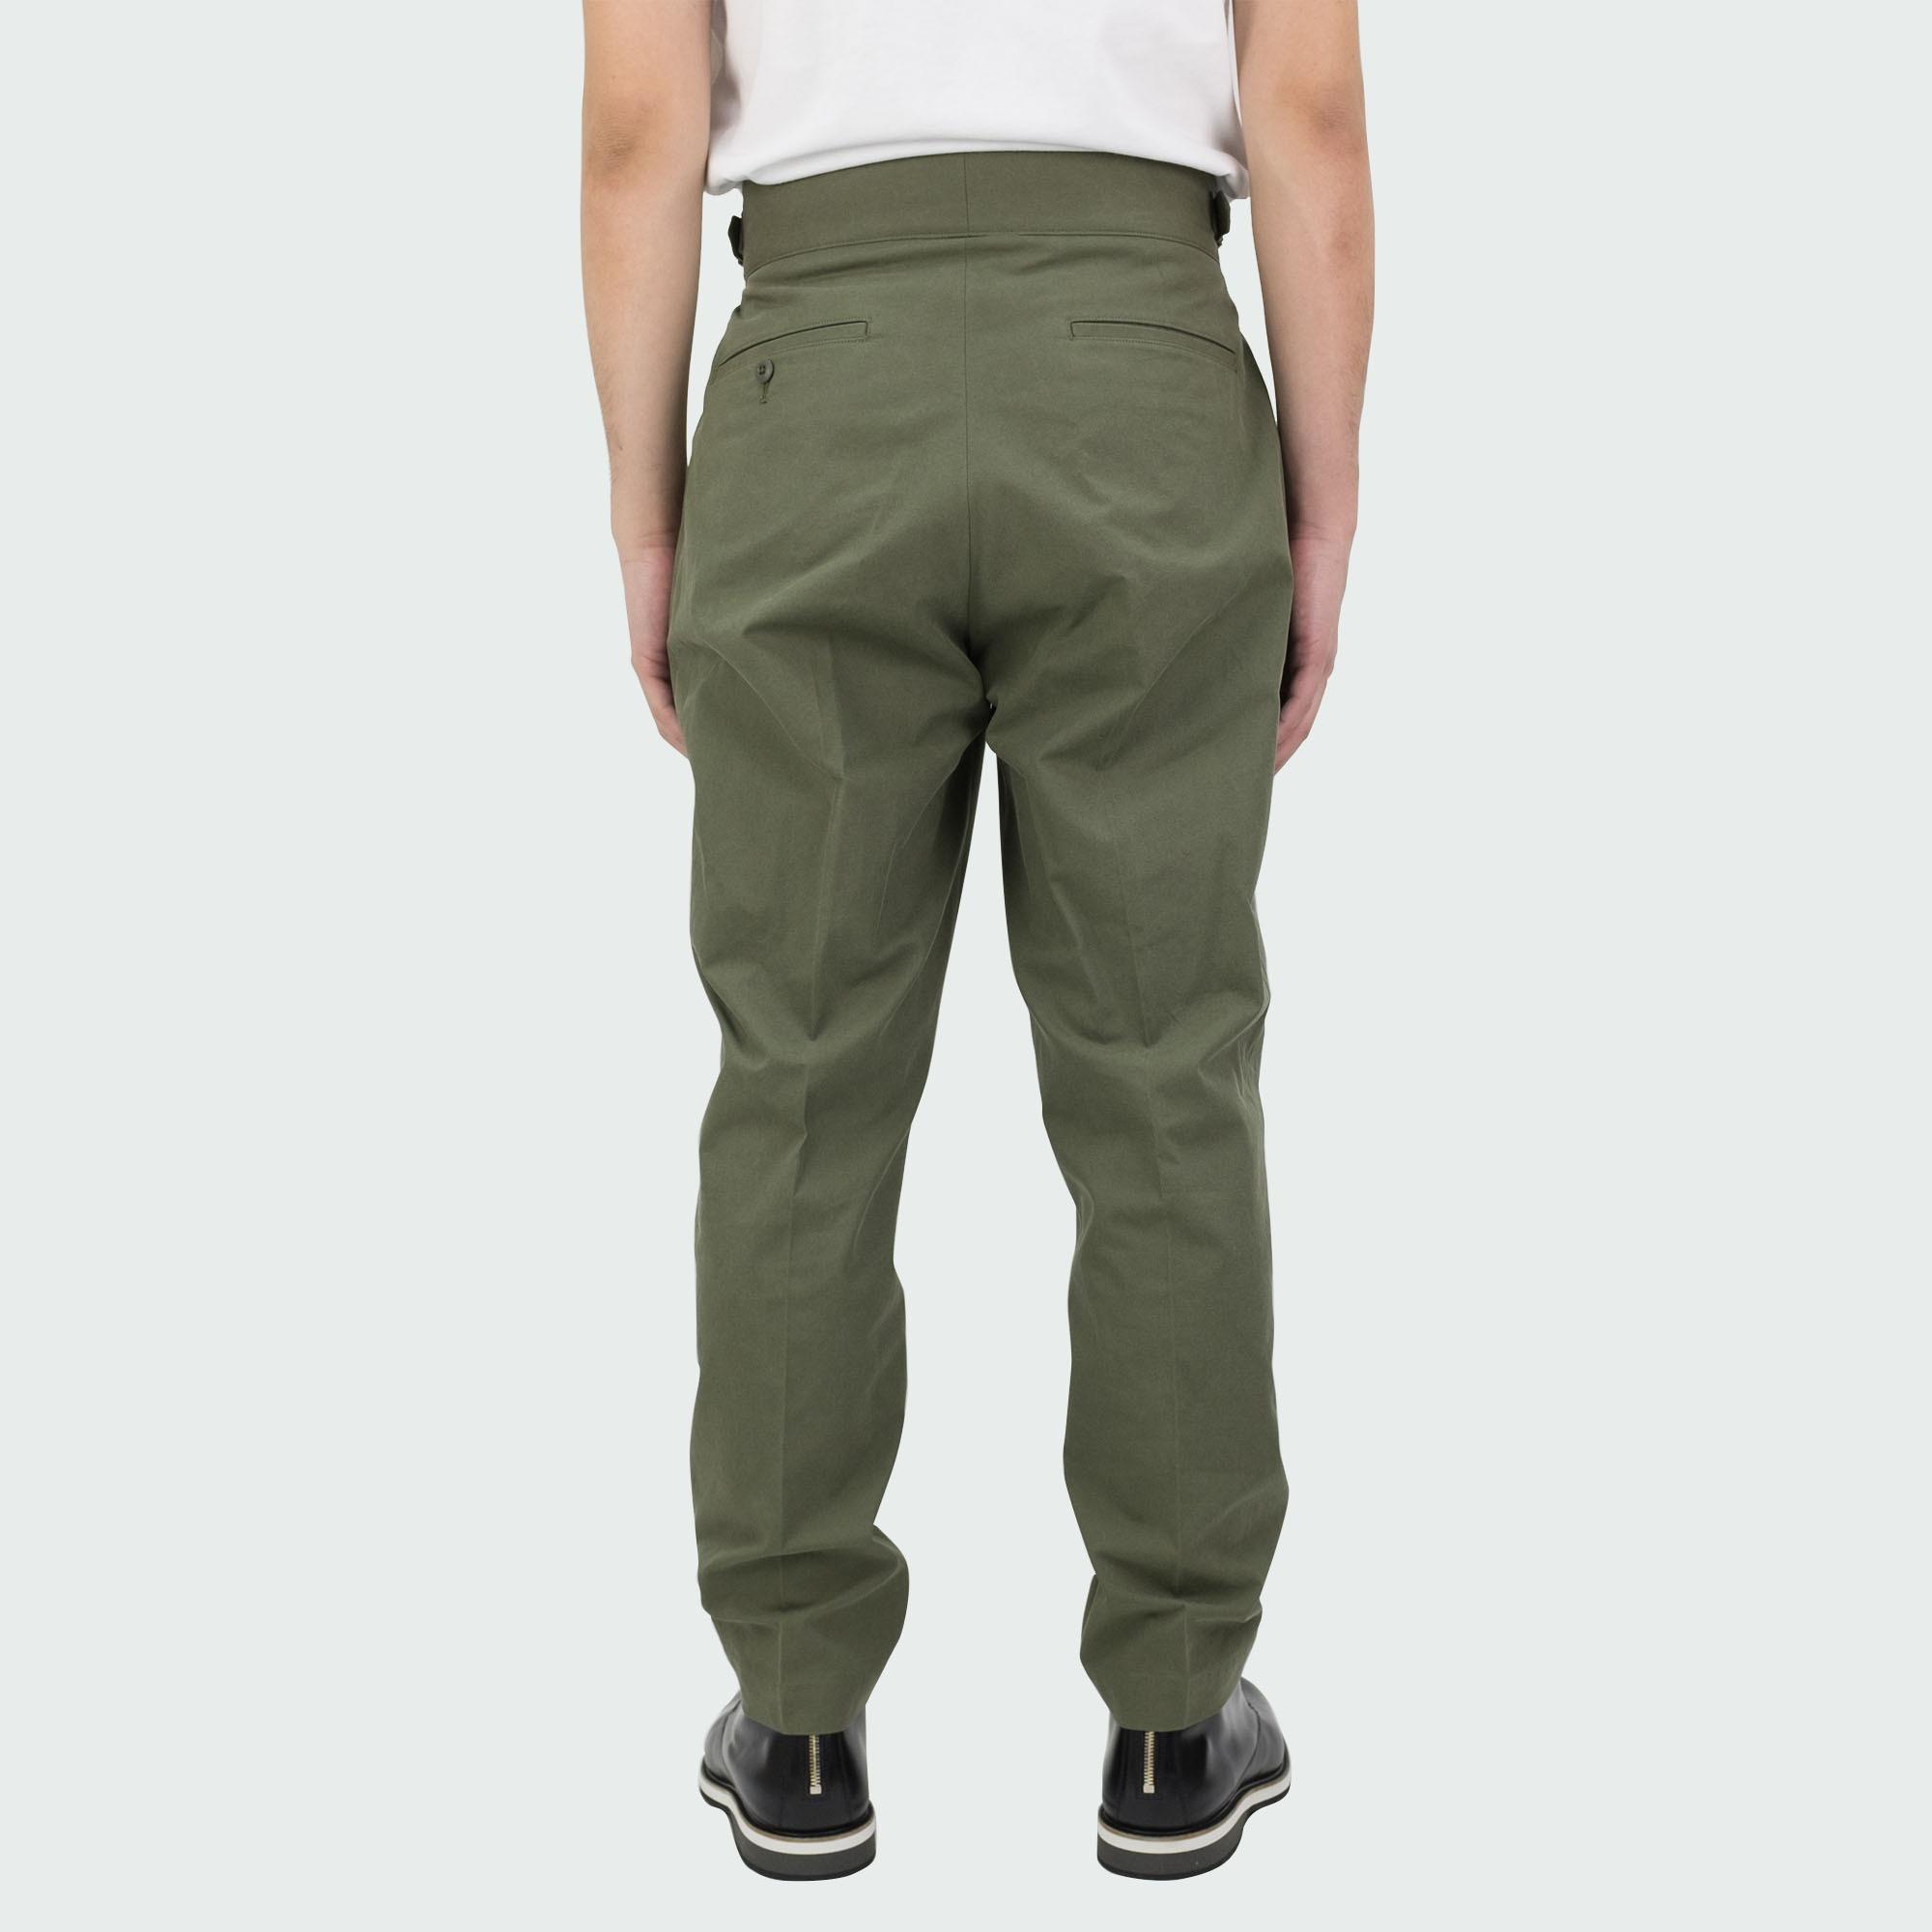 Sulfur Dyed NIDOM Gurkha Pants Khaki 4